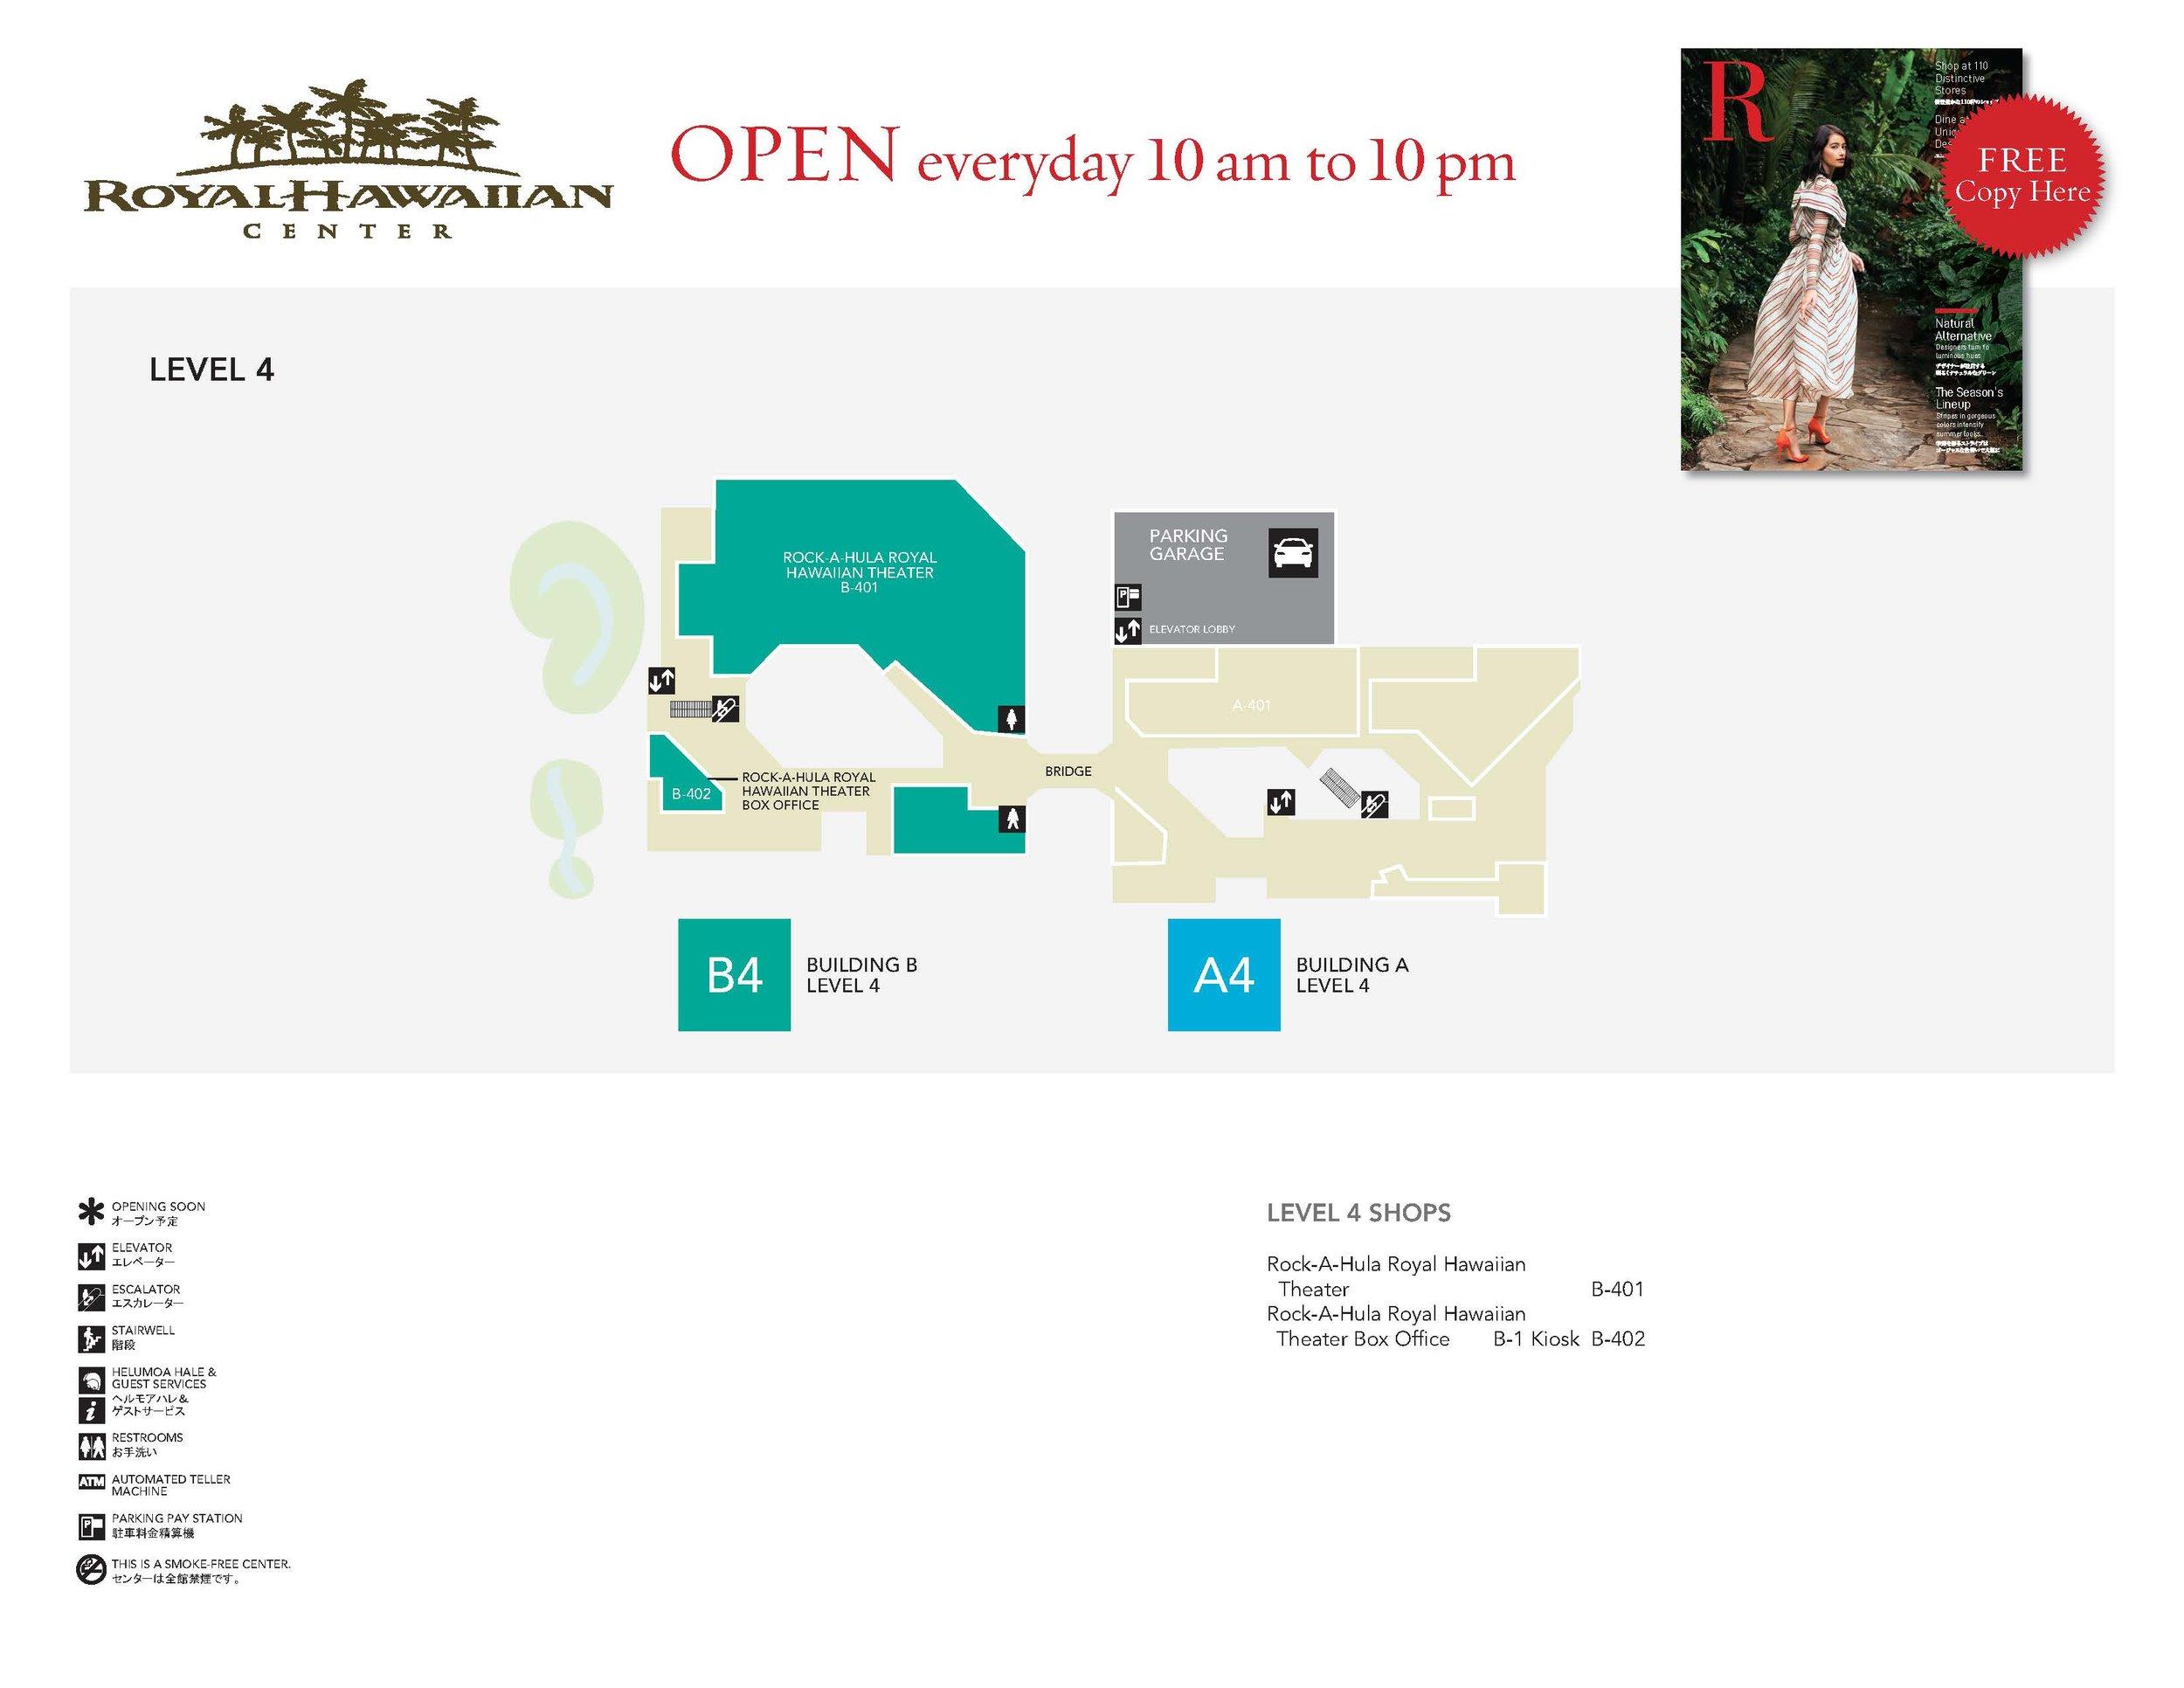 1095-16179-RH-RMag-Maps-May18-FINAL_Page_4.jpg